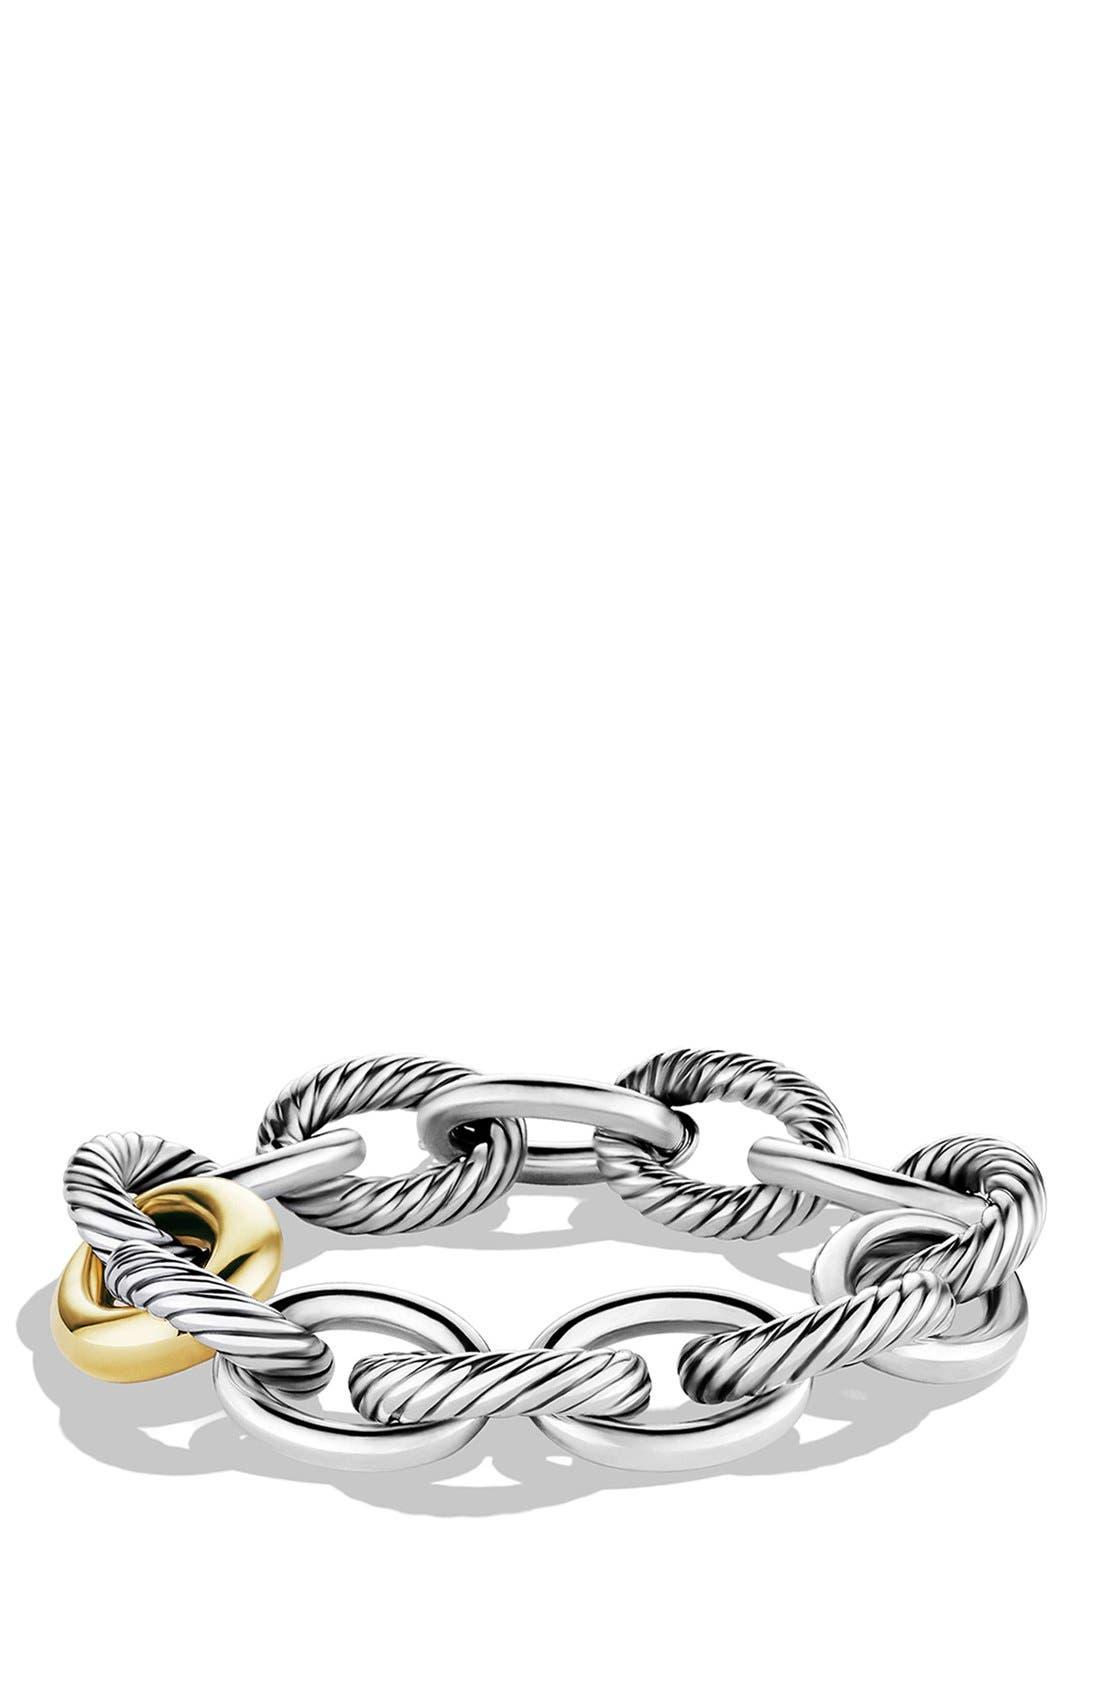 Main Image - David Yurman 'Oval' Extra-Large Link Bracelet with Gold